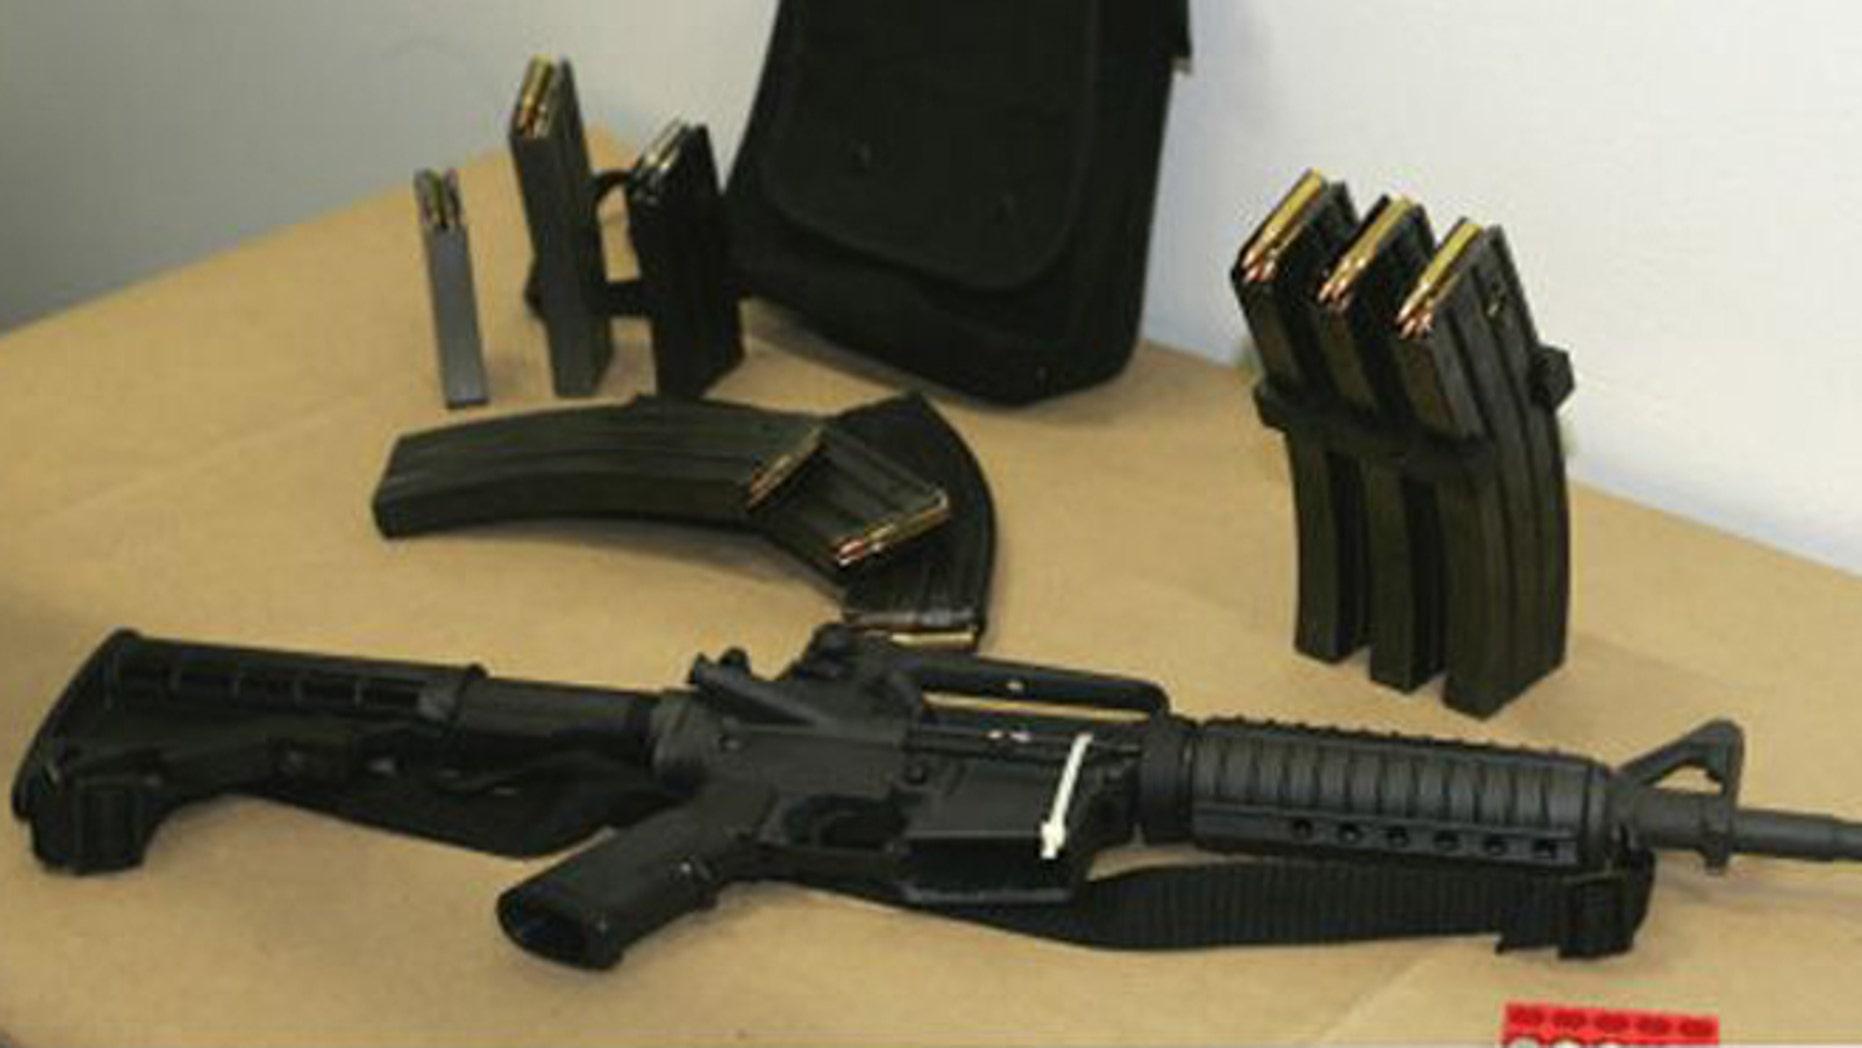 FILE: Bushmaster AR-15 semi-automatic rifle and ammunition.